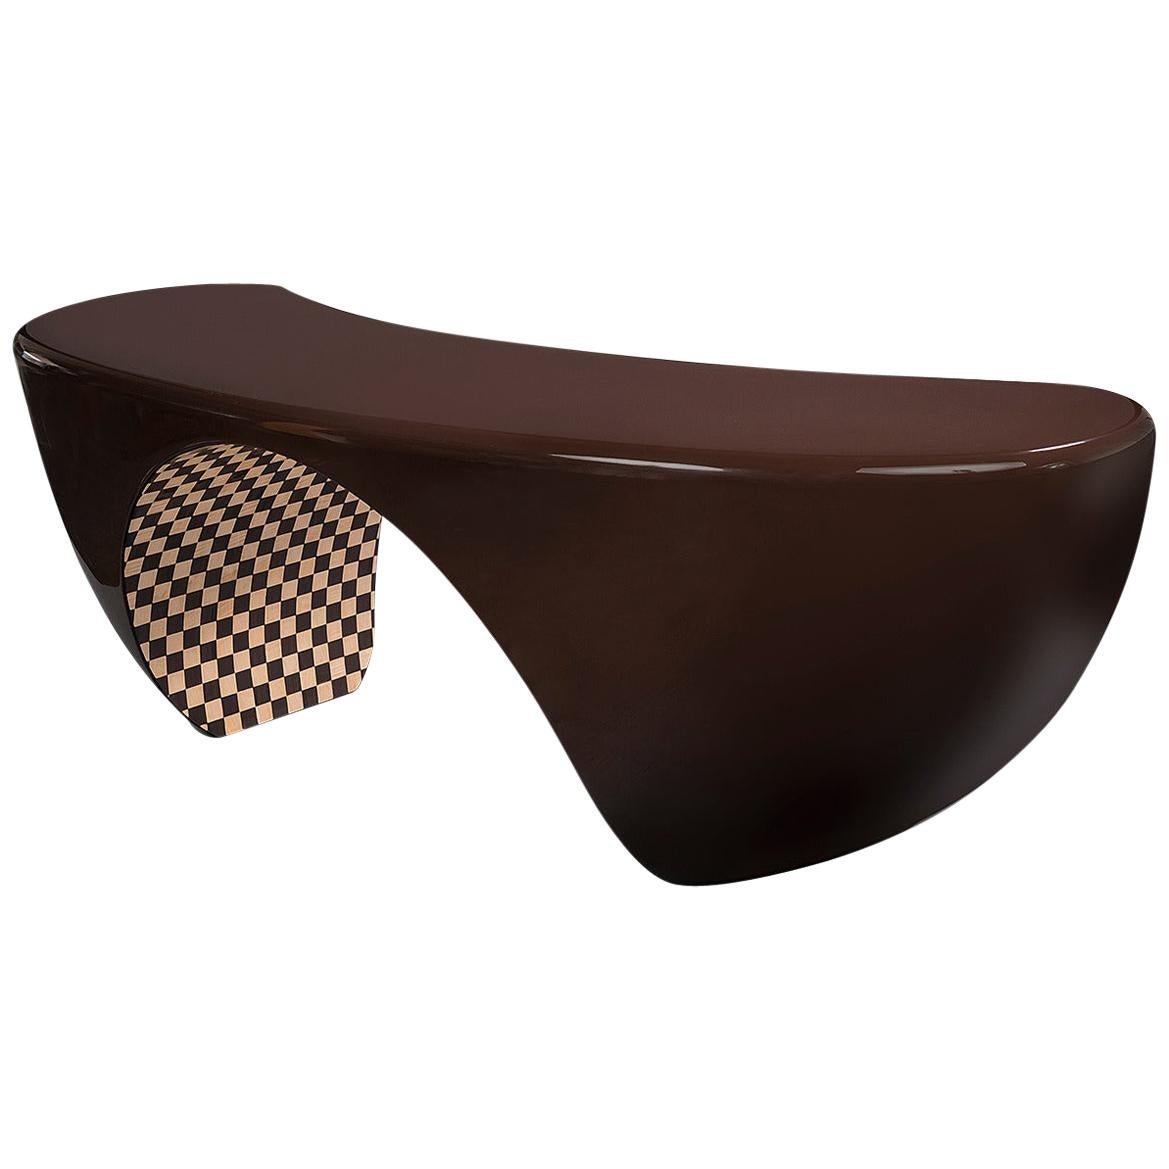 Design Desk, French Designer Charly Bounan